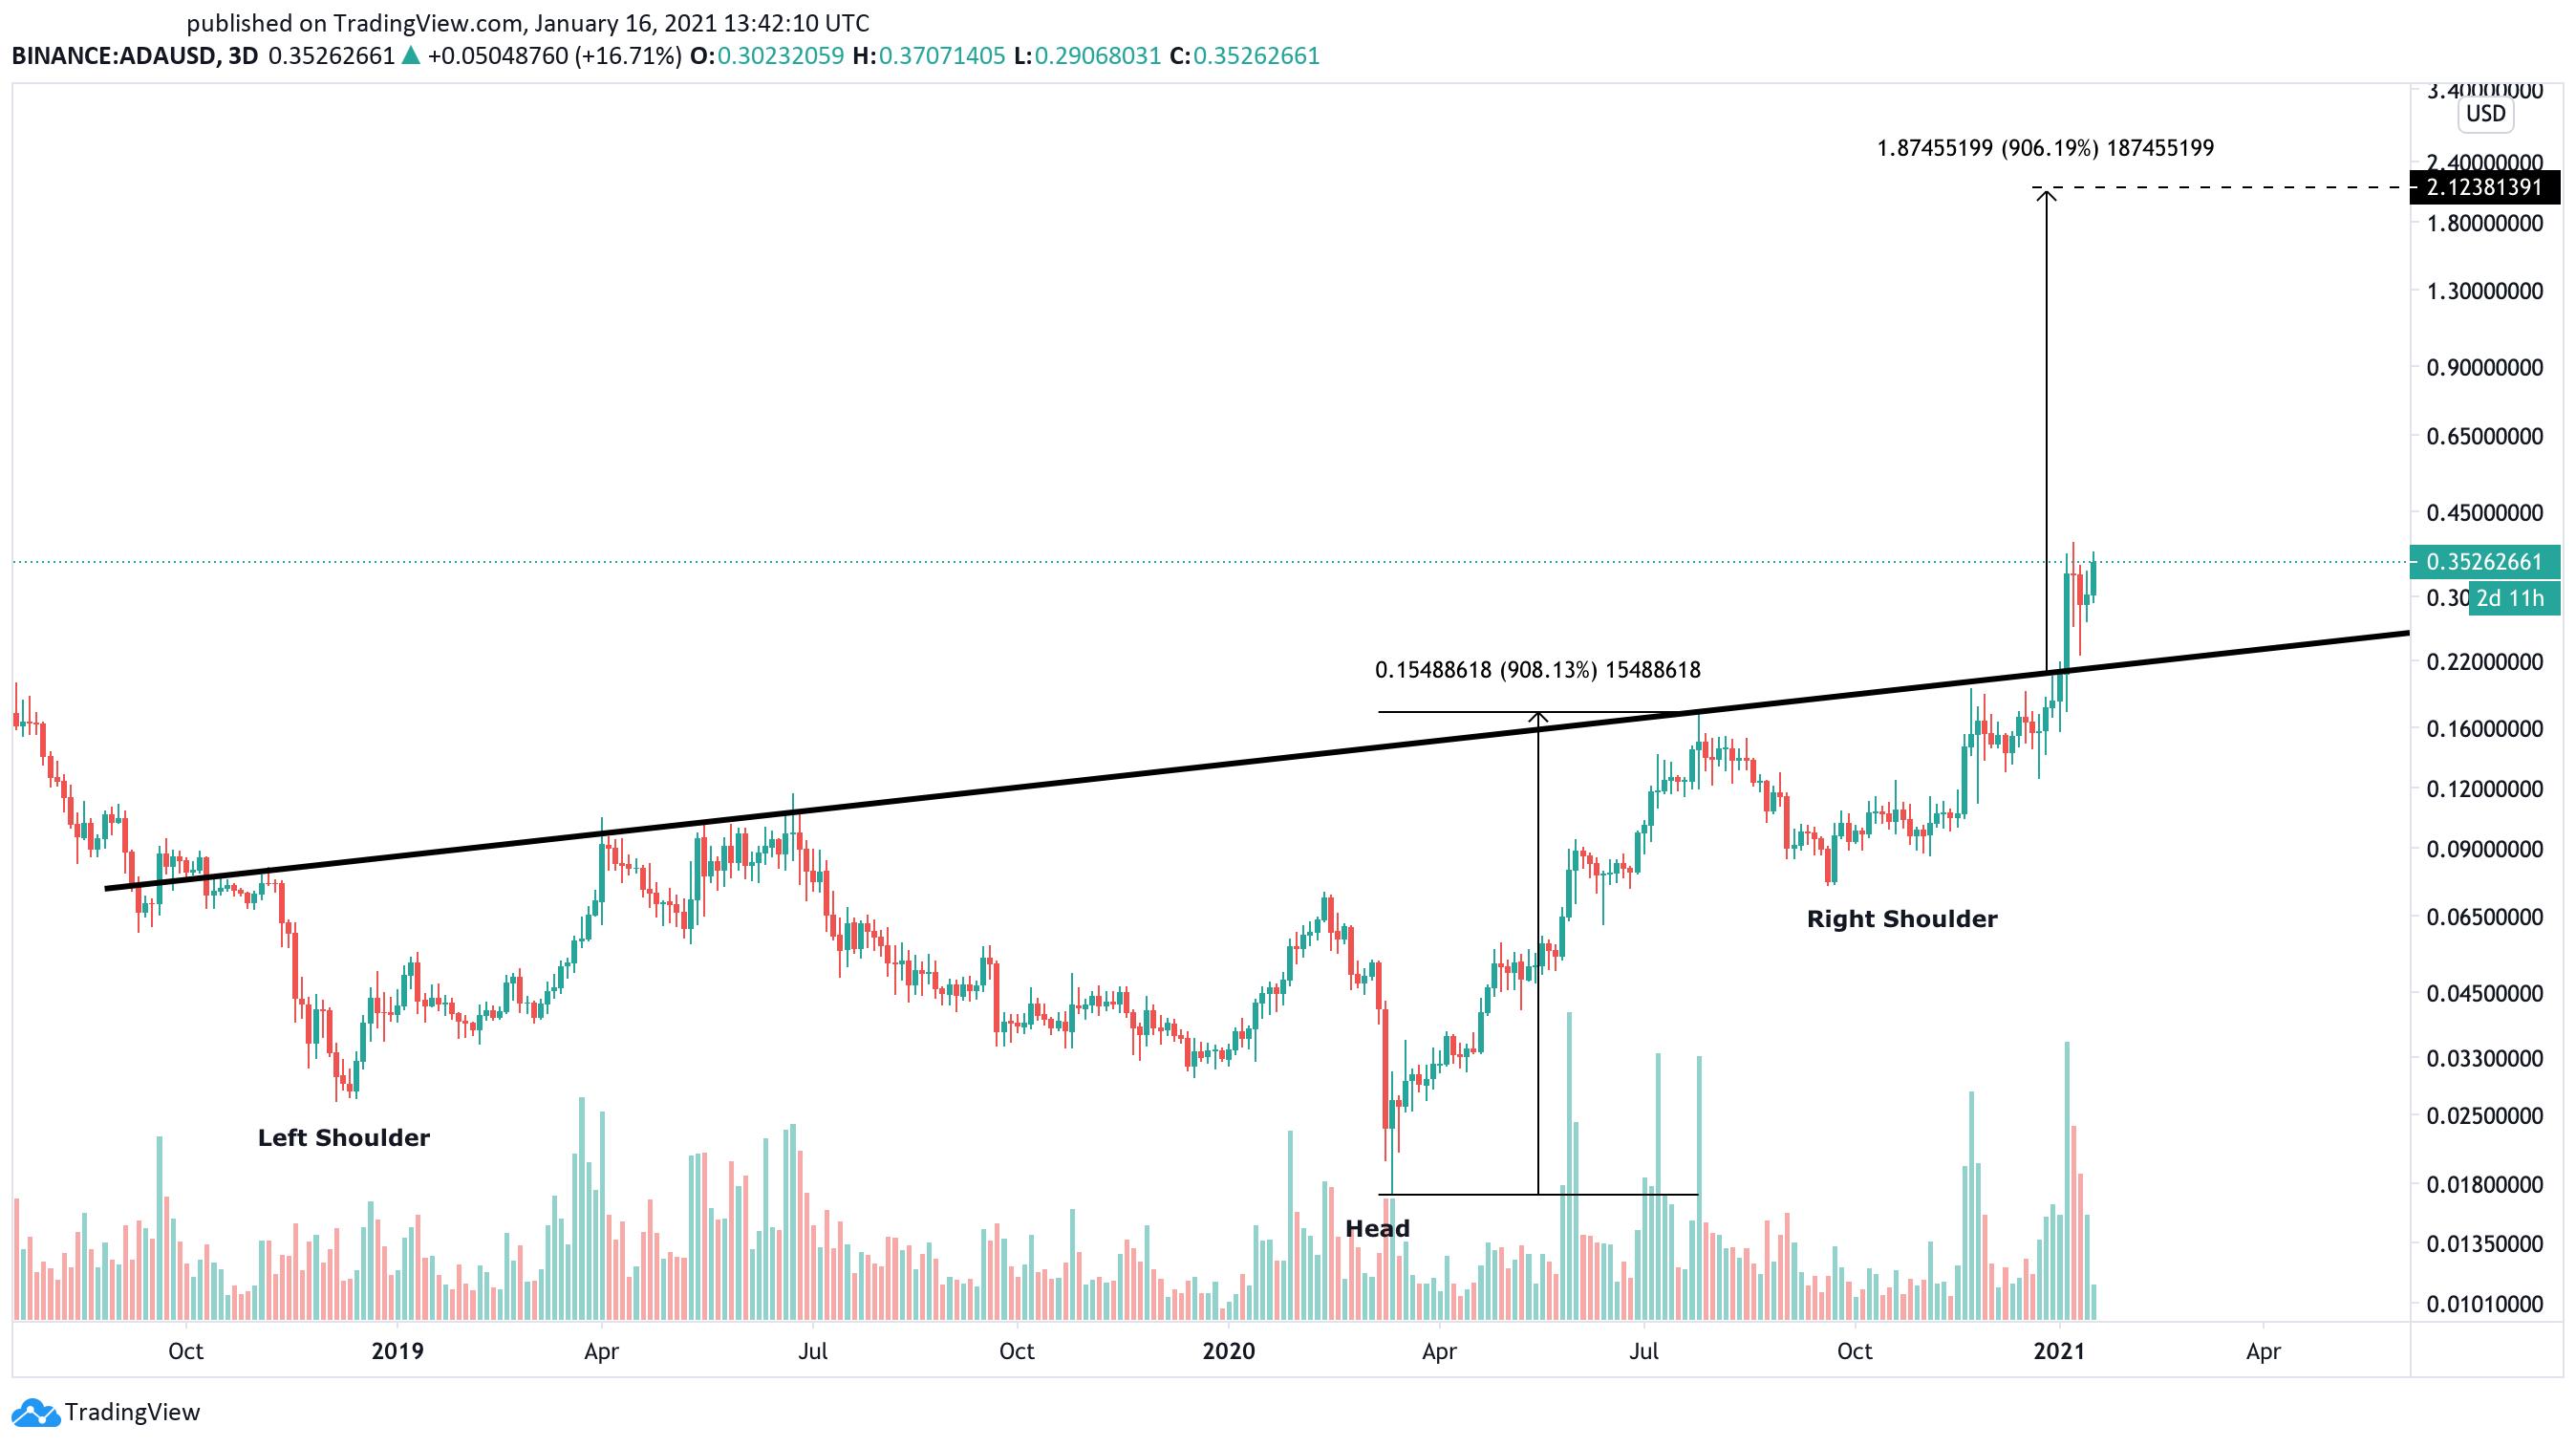 Cardano US dollar price chart